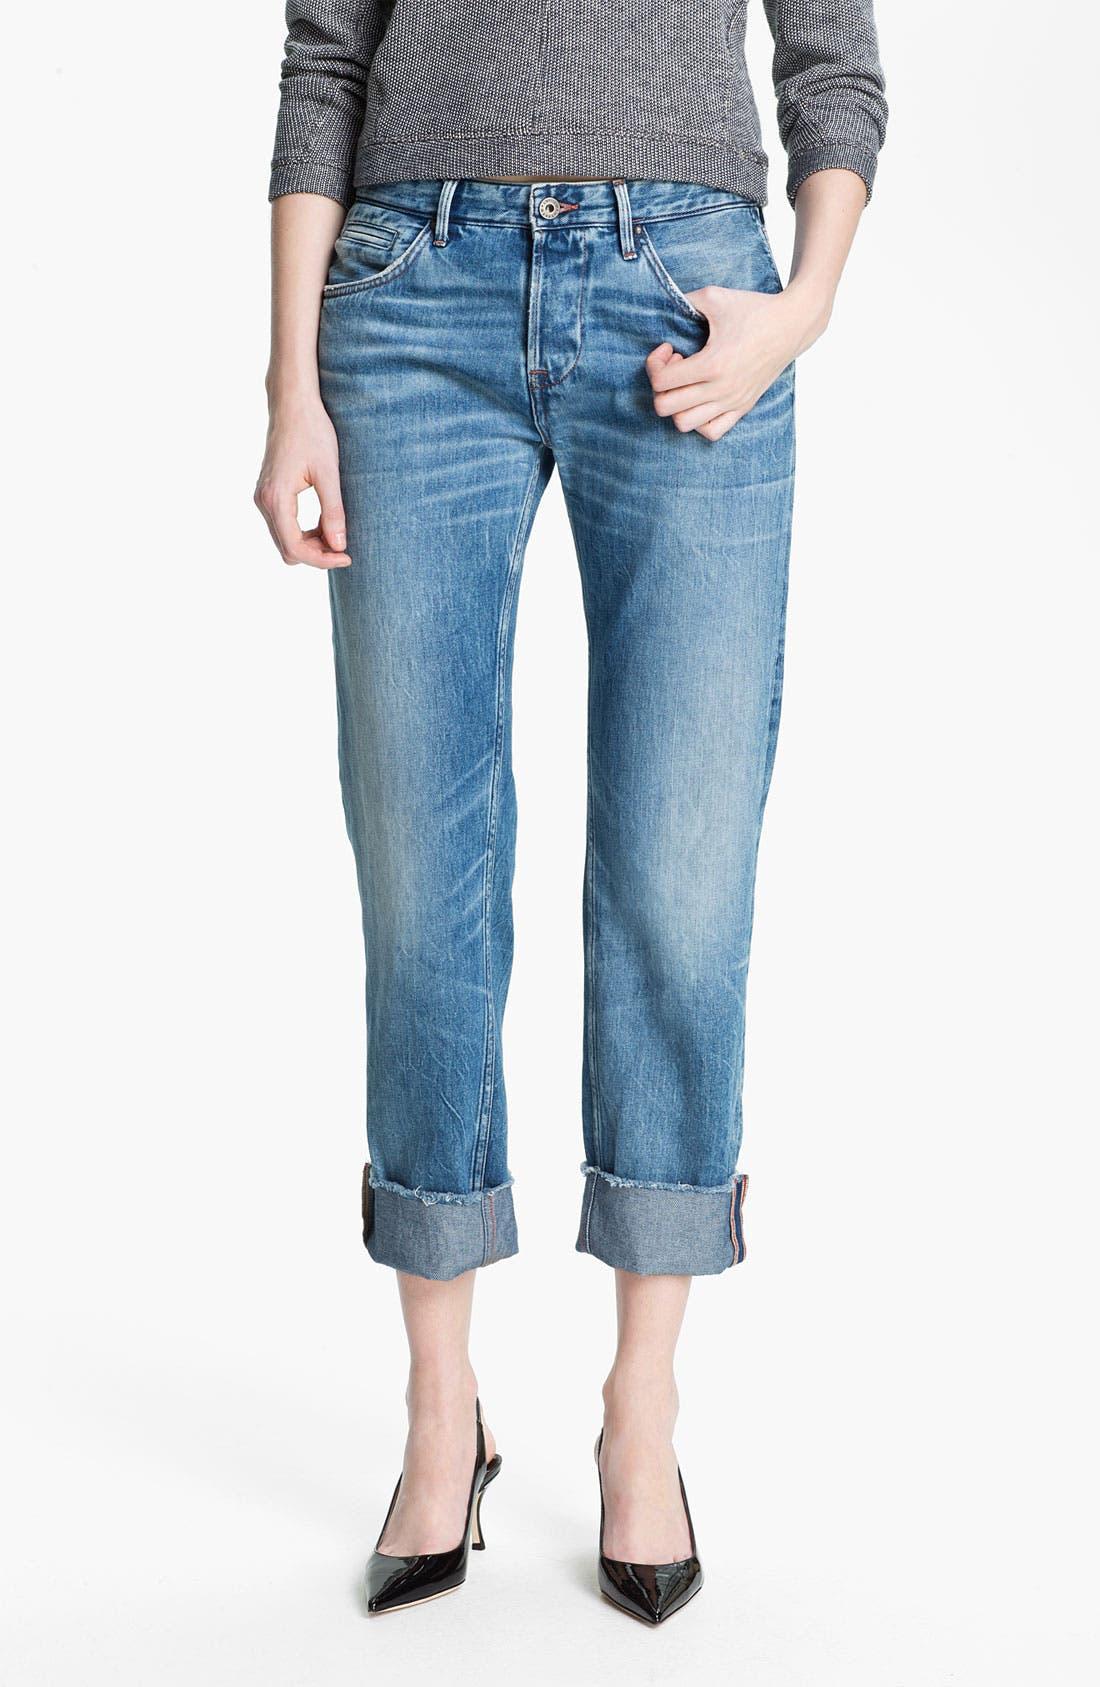 Main Image - Twenty8Twelve 'Jonny' Boyfriend Jeans